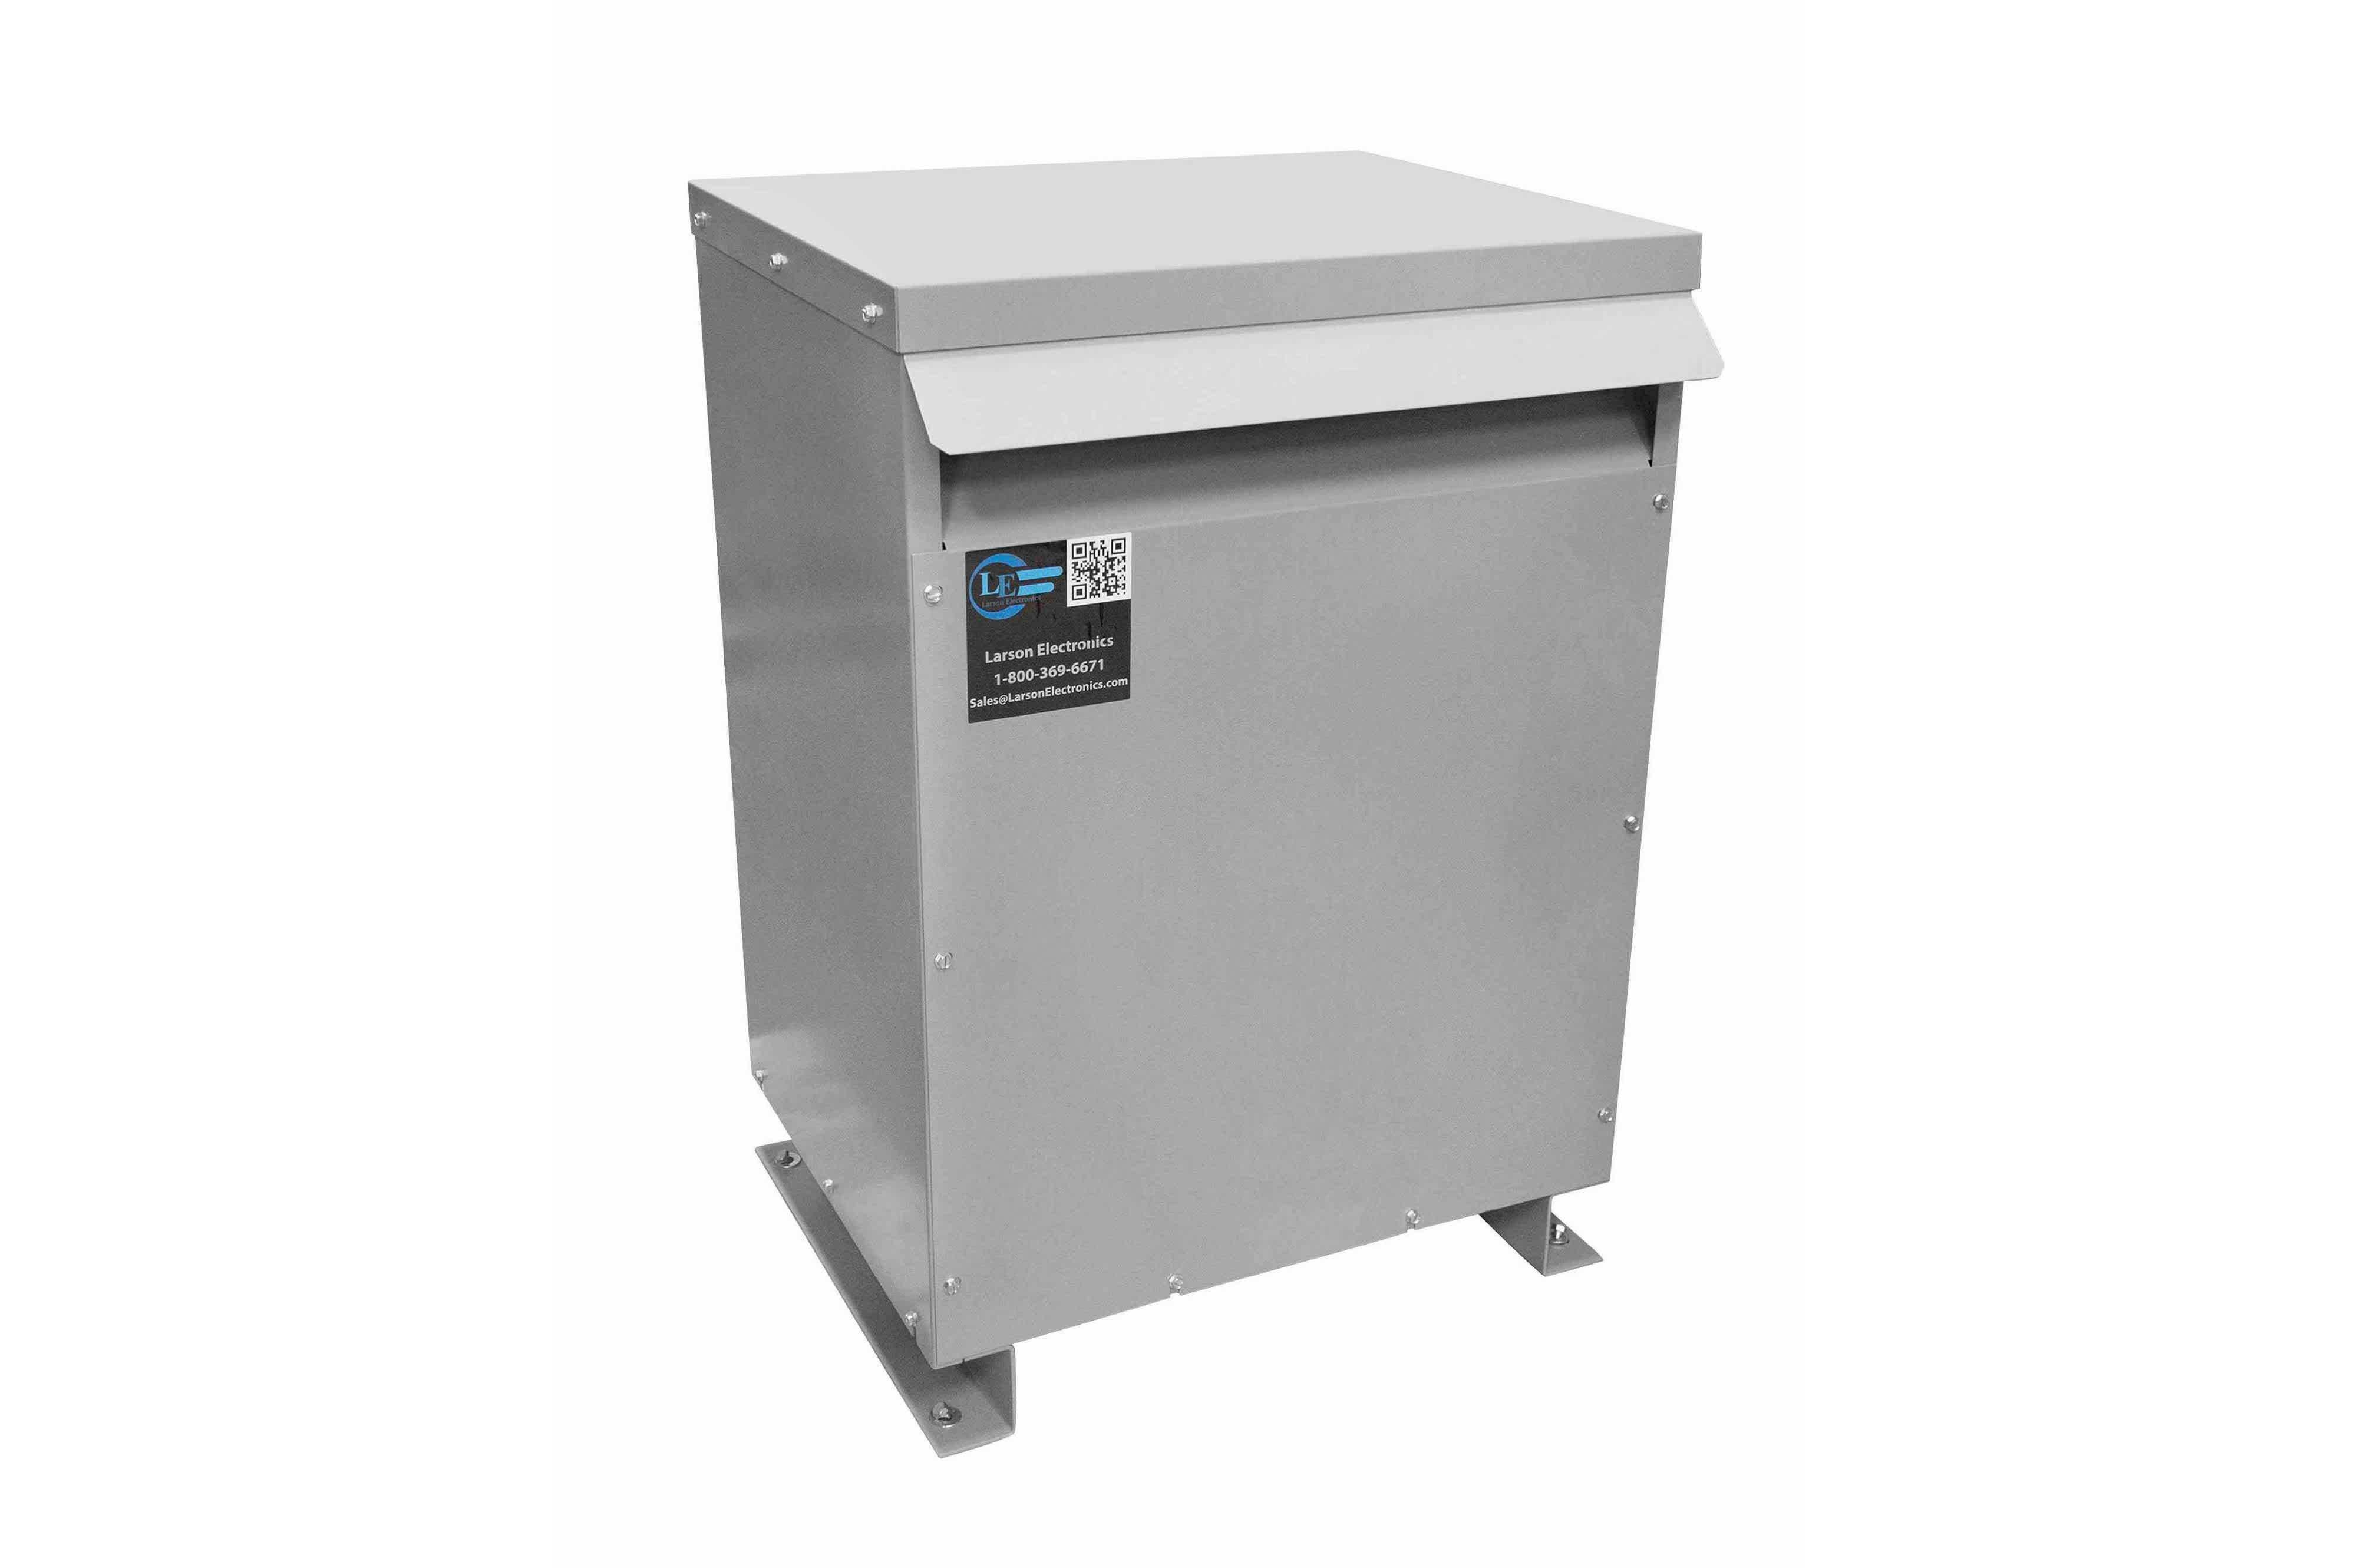 15 kVA 3PH Isolation Transformer, 600V Wye Primary, 415Y/240 Wye-N Secondary, N3R, Ventilated, 60 Hz